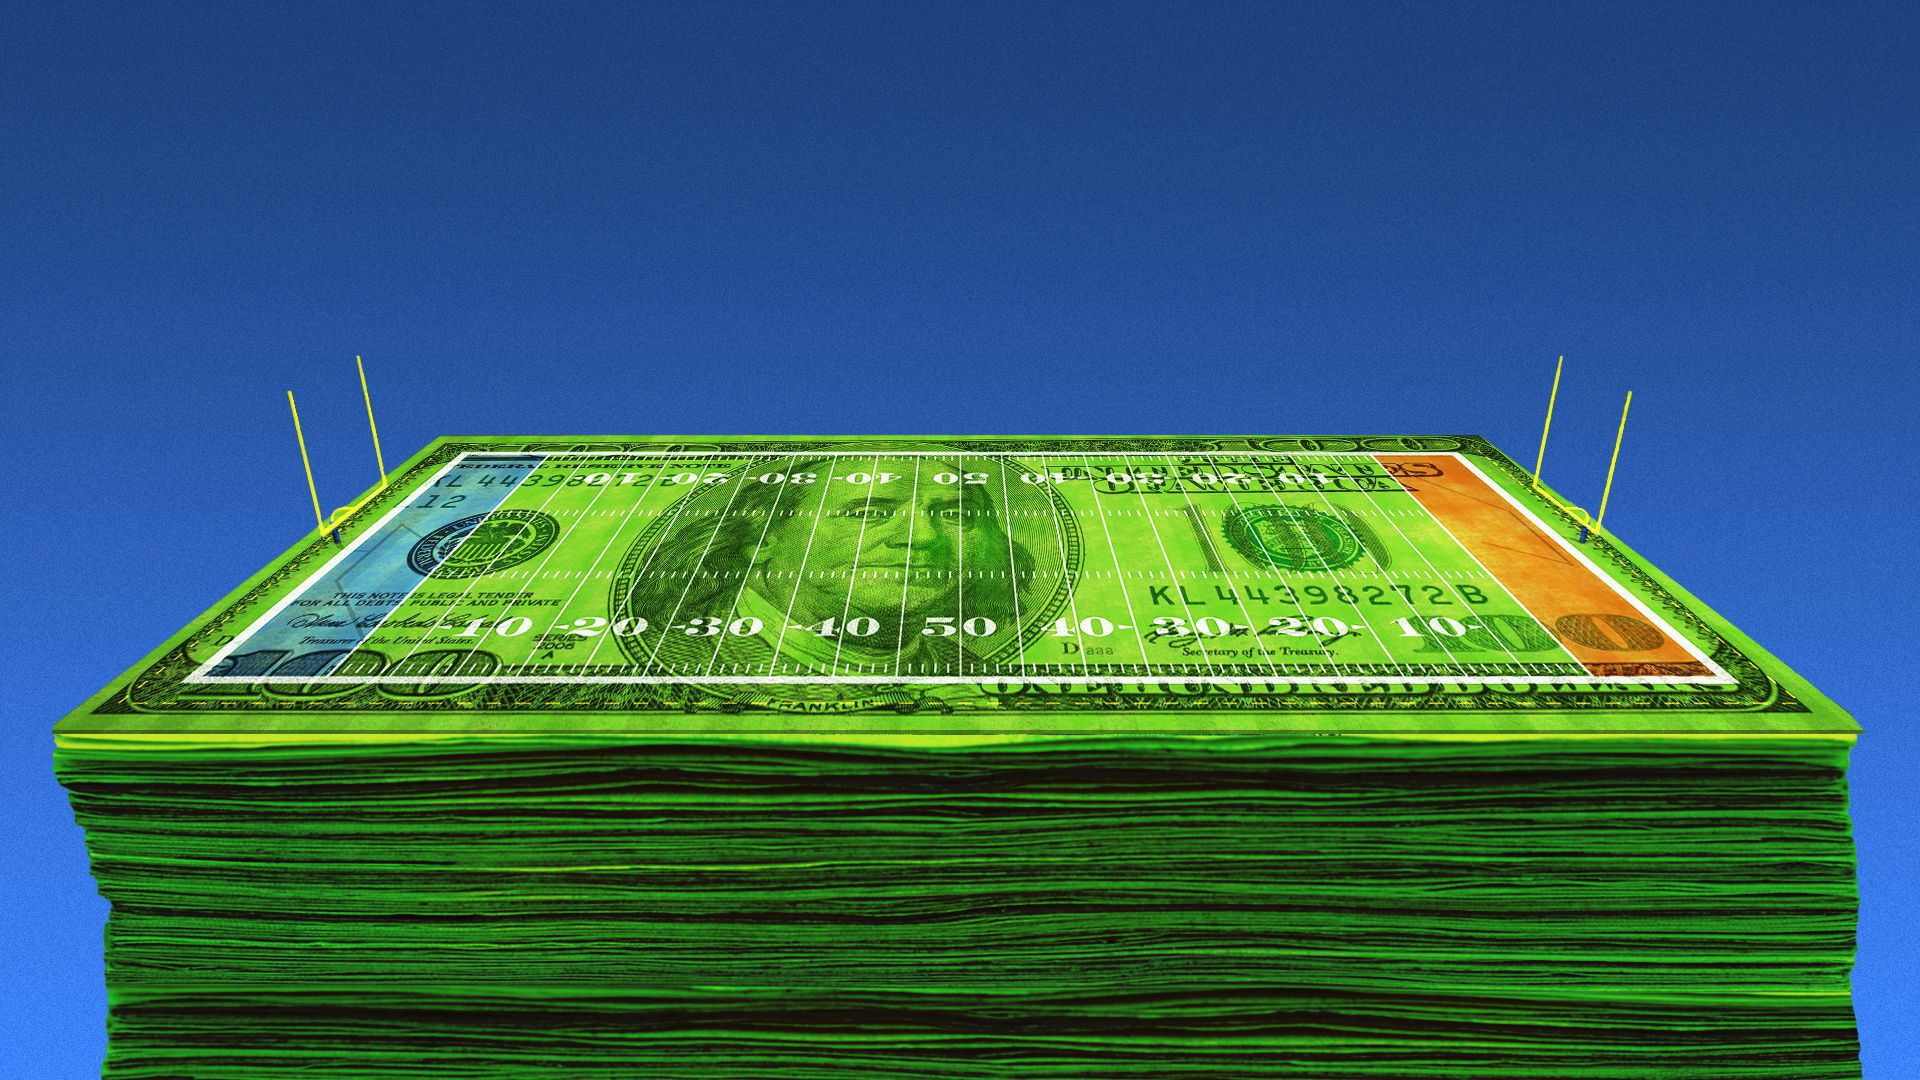 Illustration of a stack of hundred dollar bills underneath a football field.